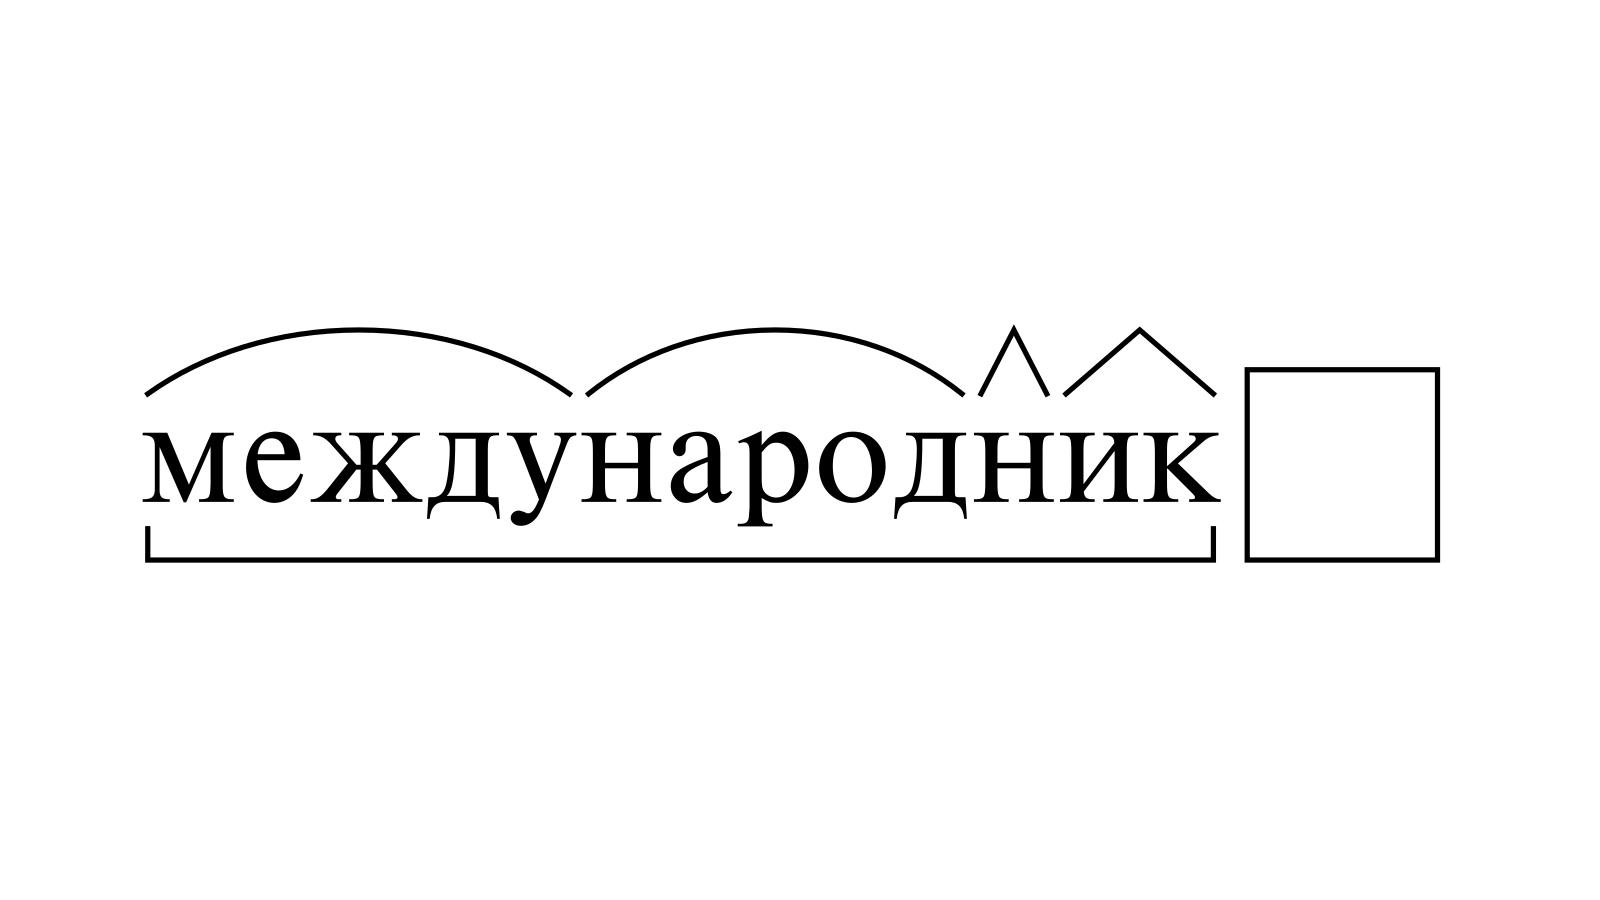 Разбор слова «международник» по составу